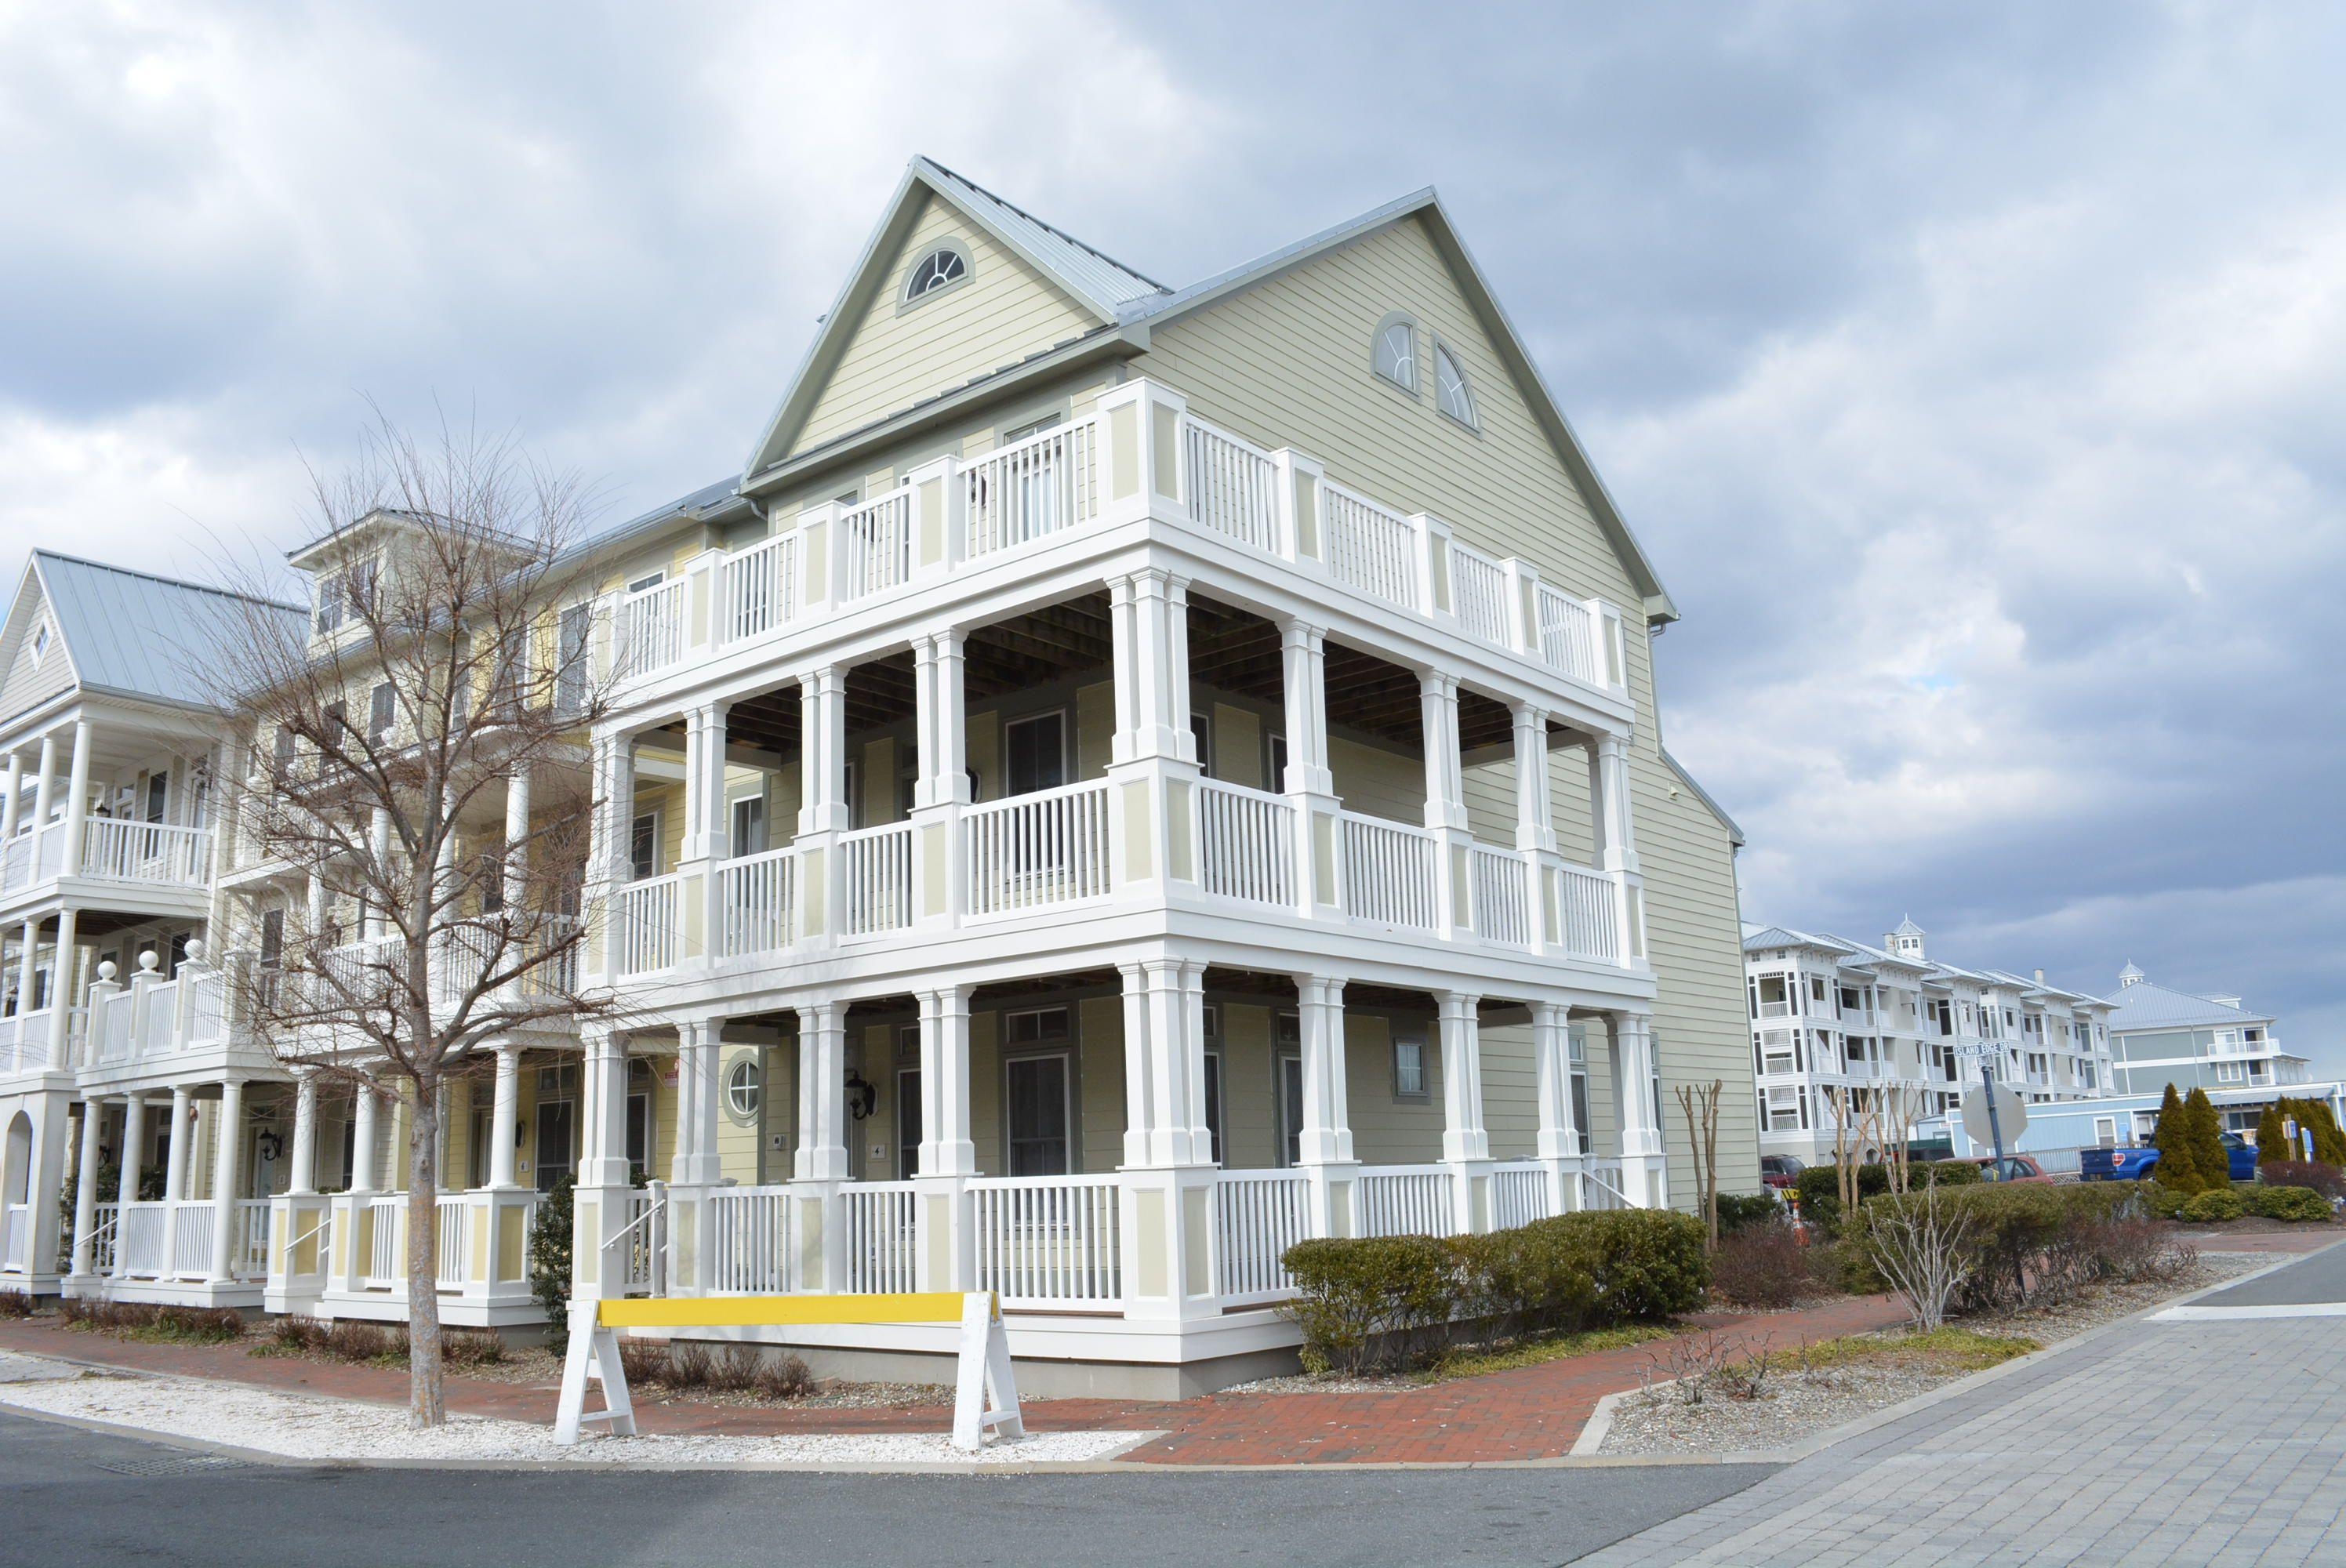 SUNSET ISLAND 4 - Sunset Island Rentals by Shoreline Properties